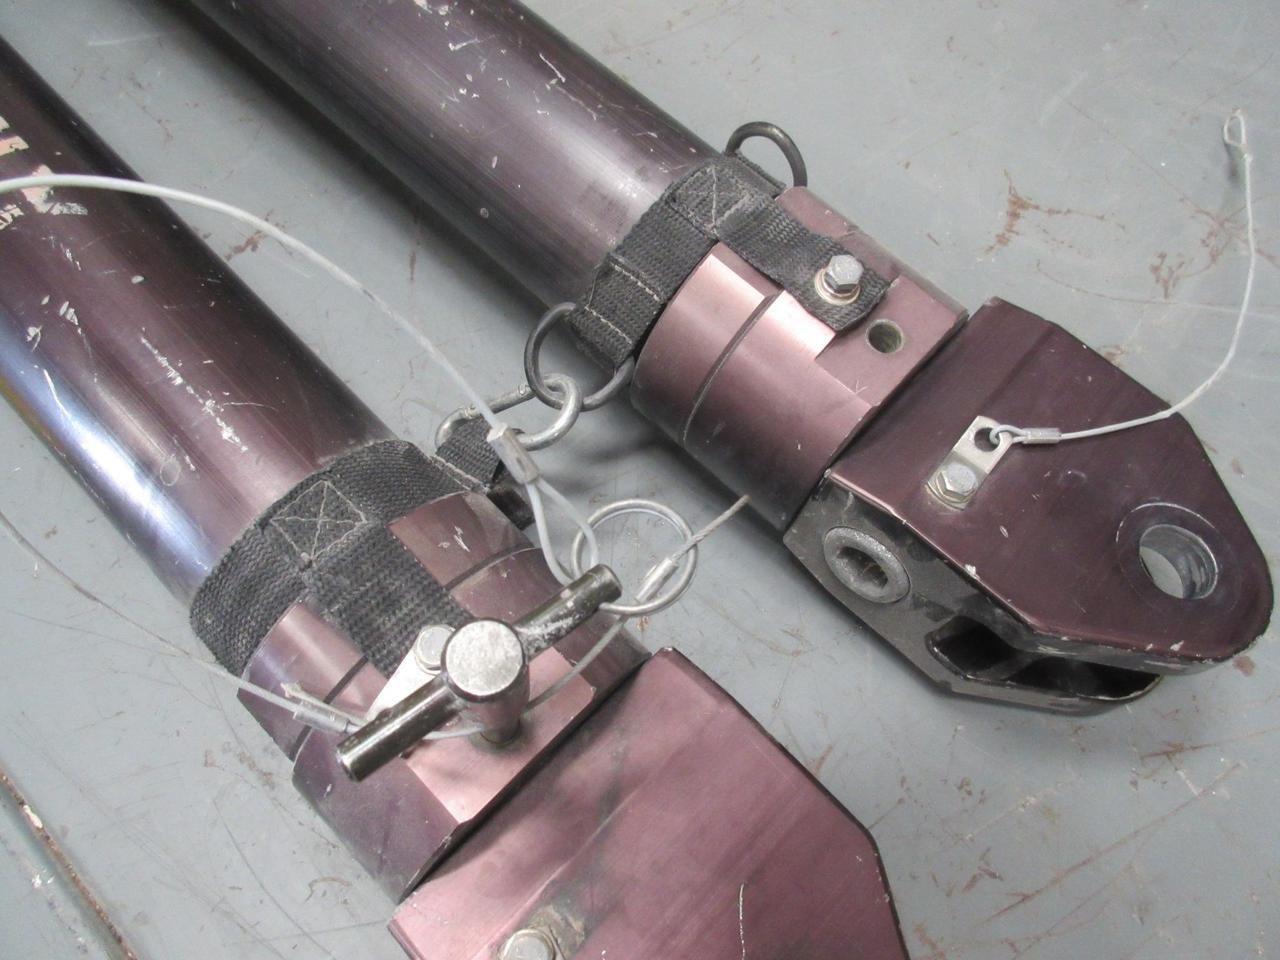 Ibis Tek 1sc69 2512 100 0 Tow Bar 40000 Lbs Cap Light Wiring Harness Extends 22 T47981 Industrial Scientific